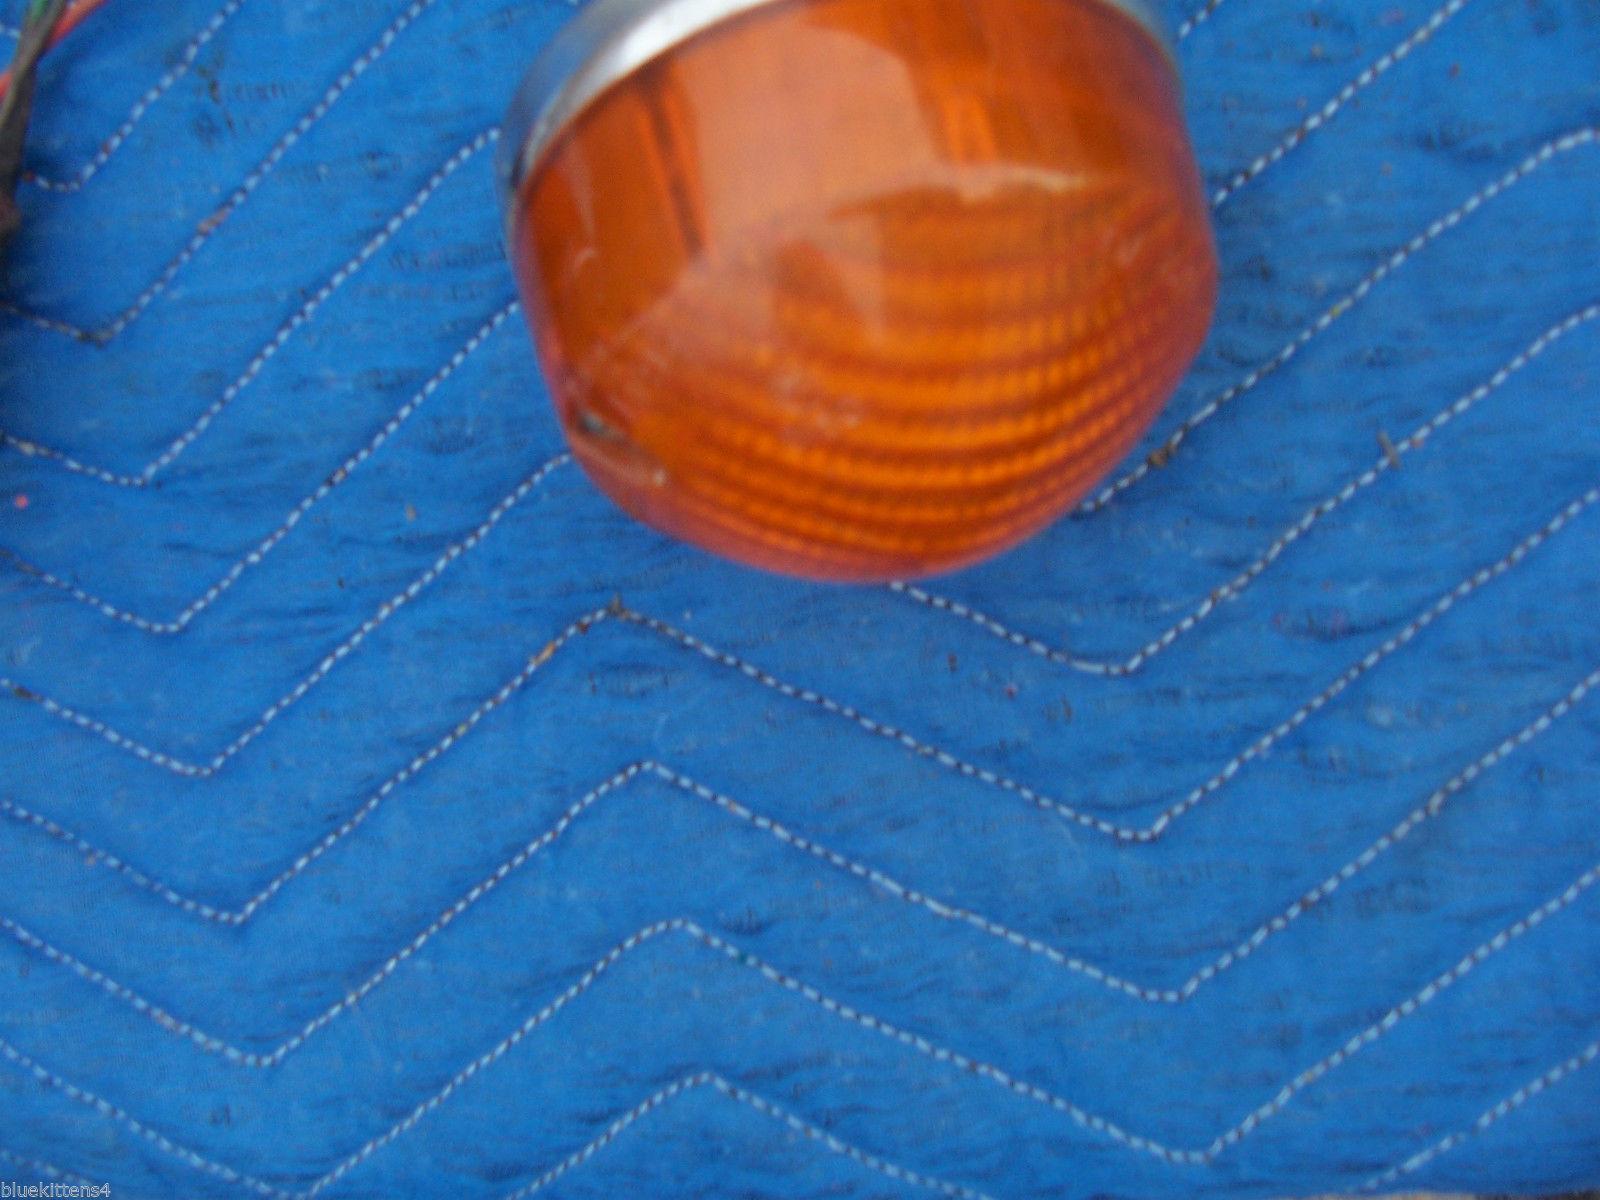 1971 LOTUS EUROPA RIGHT FRONT MARKER LIGHT OEM USED ORIGINAL LUCAS ENGLAND PART image 4